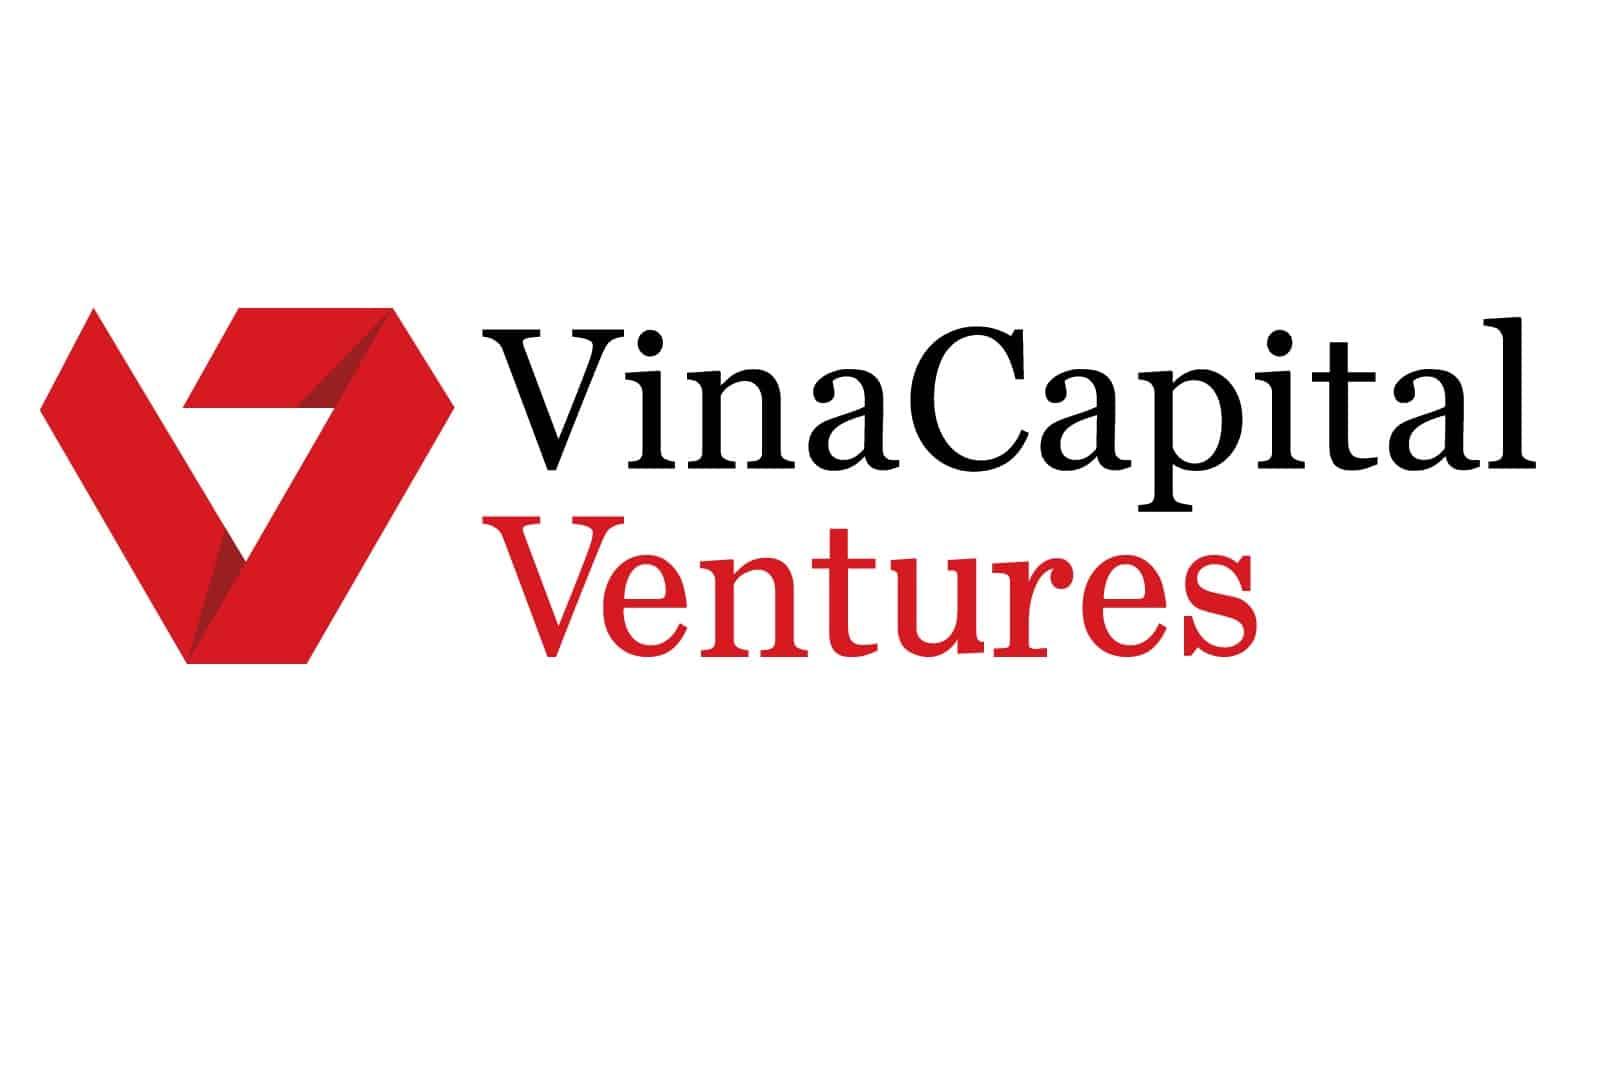 VinaCapital Ventures Invests in Vietnamese Logistics Start-Up An Vui